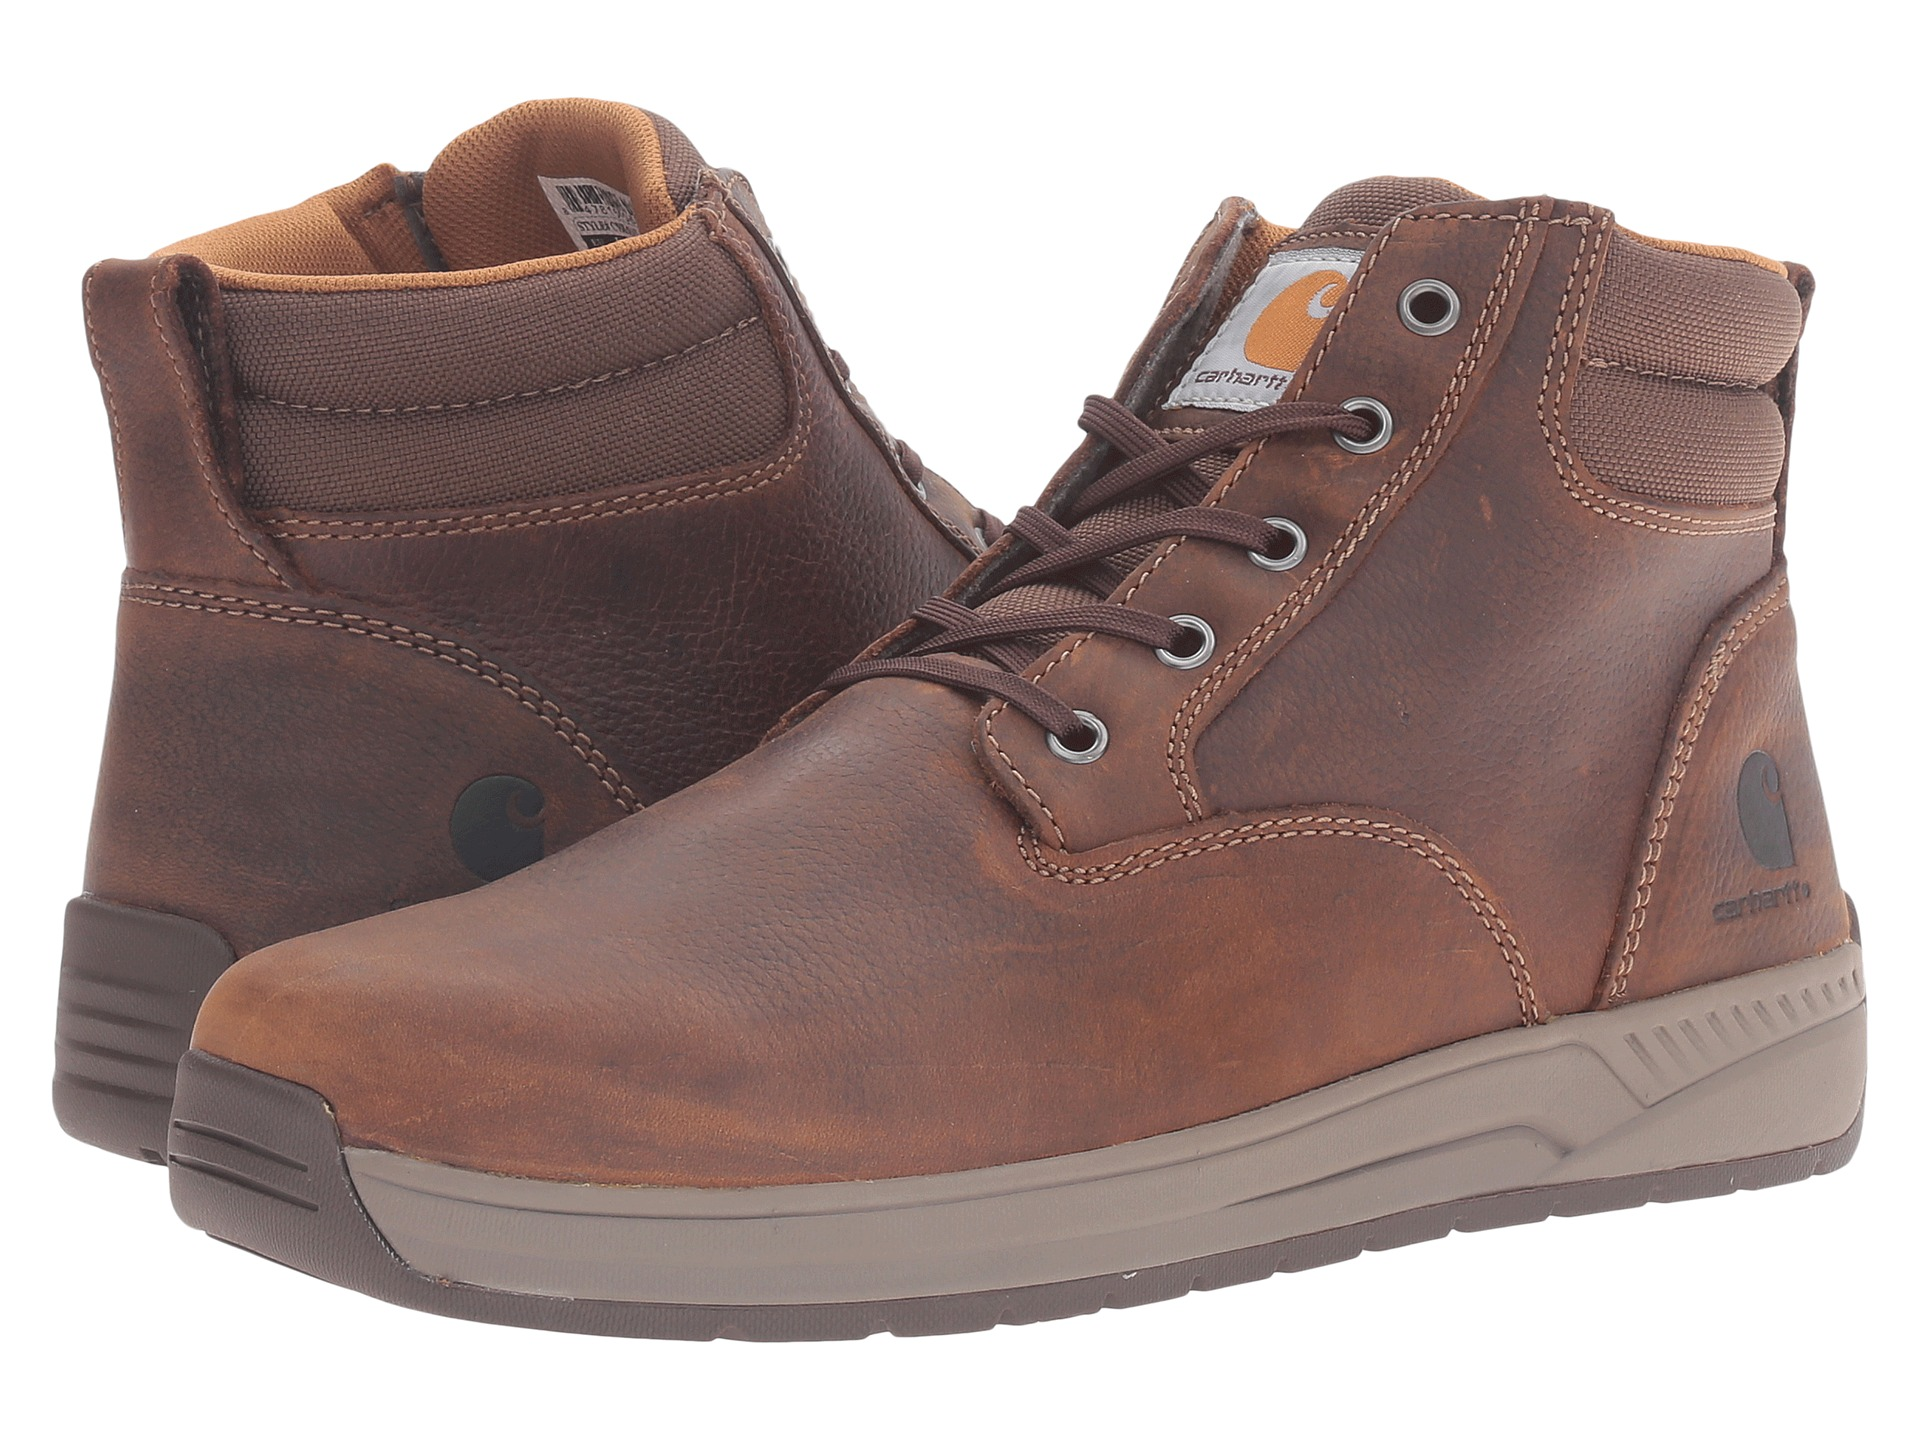 carhartt 4 quot lightweight wedge boot brown tanned